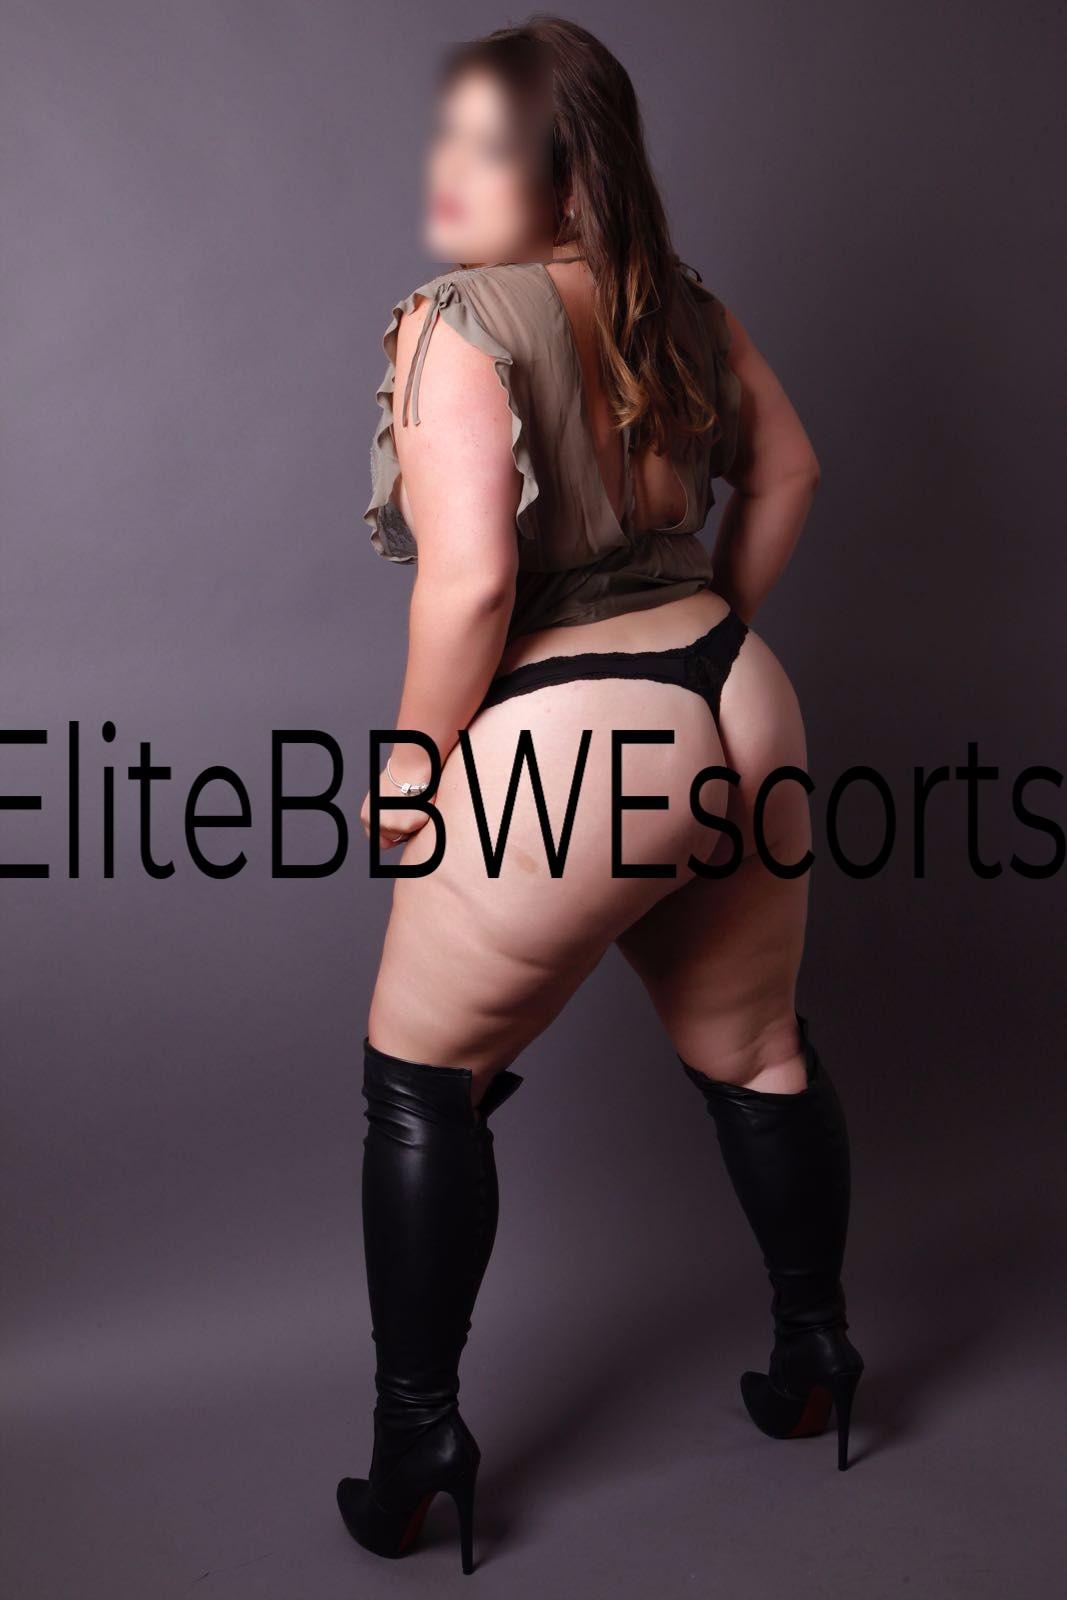 bbw escort london